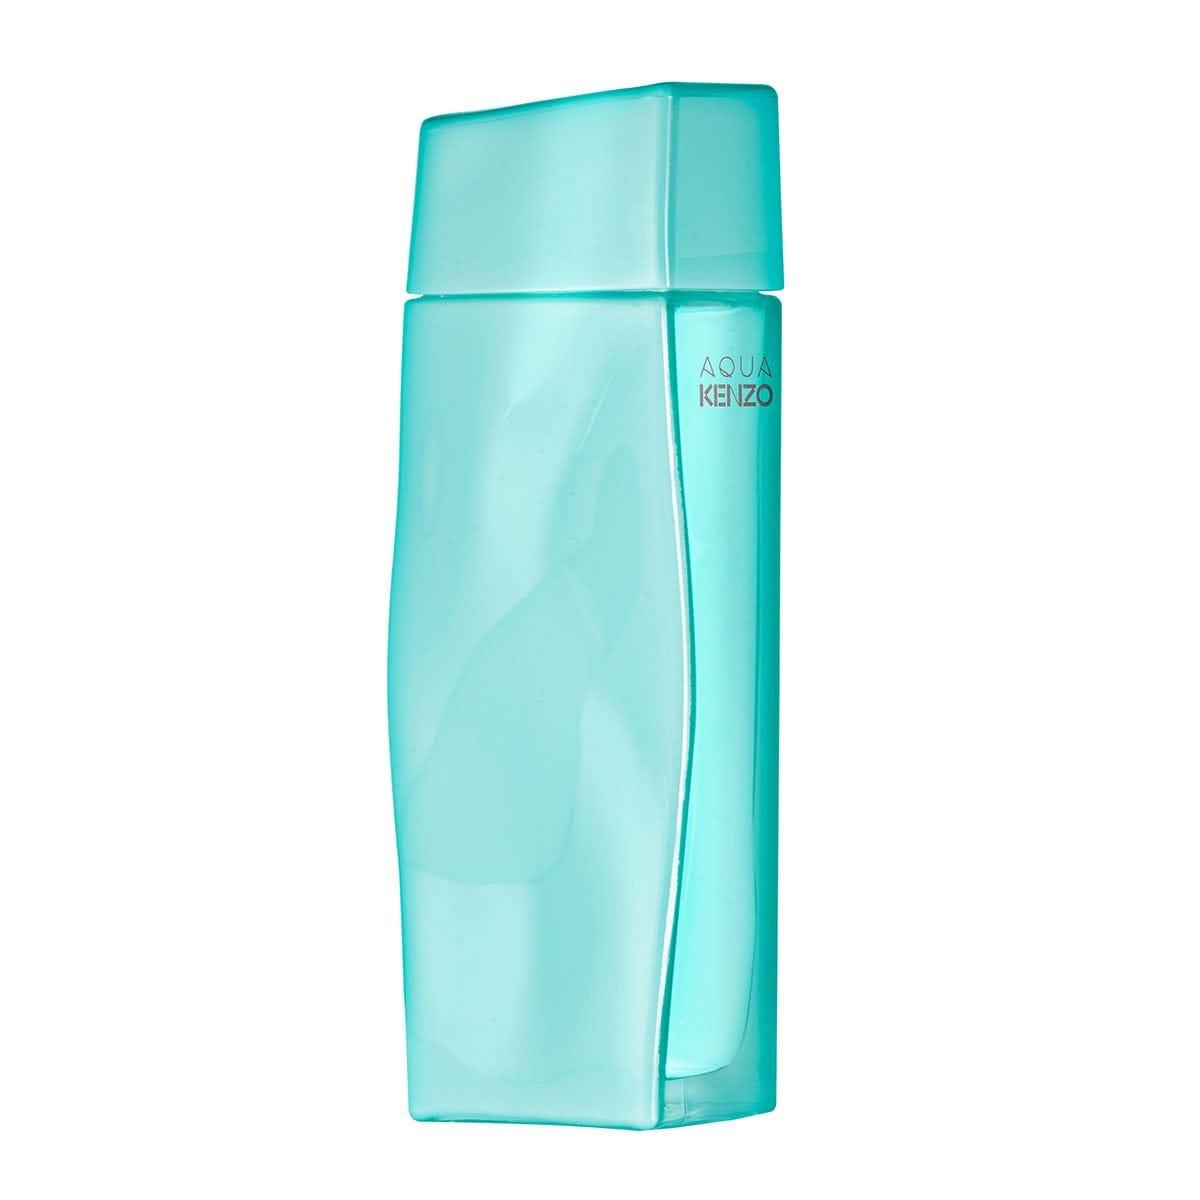 Fragancia para Dama, Aqua Kenzo pour Femme Eau De Toilette  EDT 100 ml.